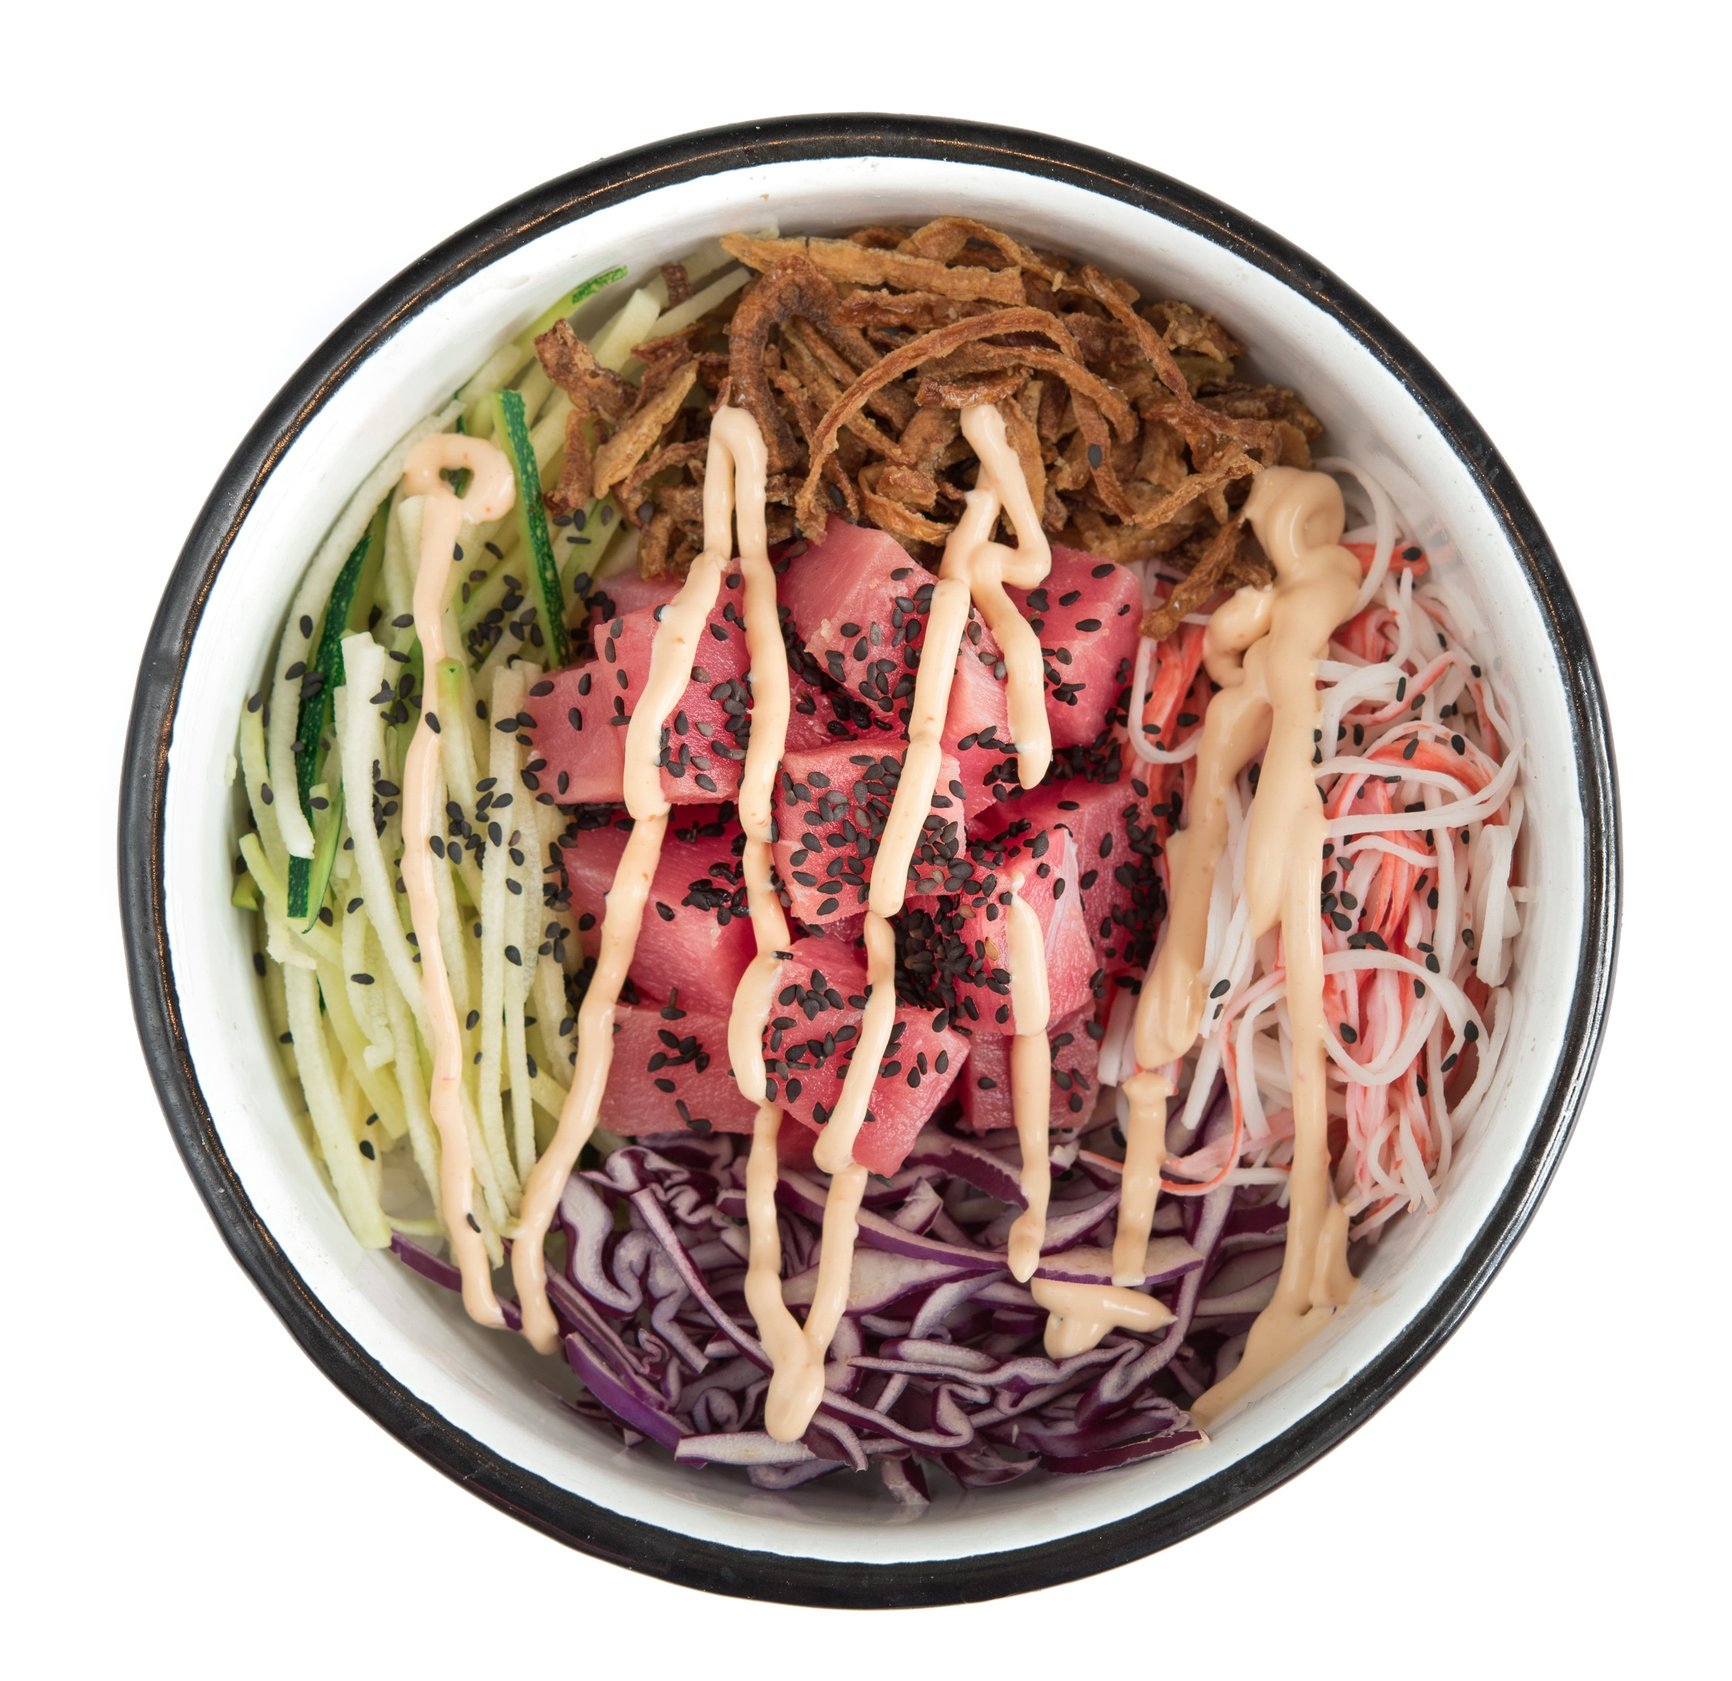 ALI'I BOWL - Mediano: 26.o00. Grande: 30.000Arroz de sushi, atún, zucchini noodles, palmito de cangrejo, cebolla crunch, repollo, ajonjolí, sriracha mayo.